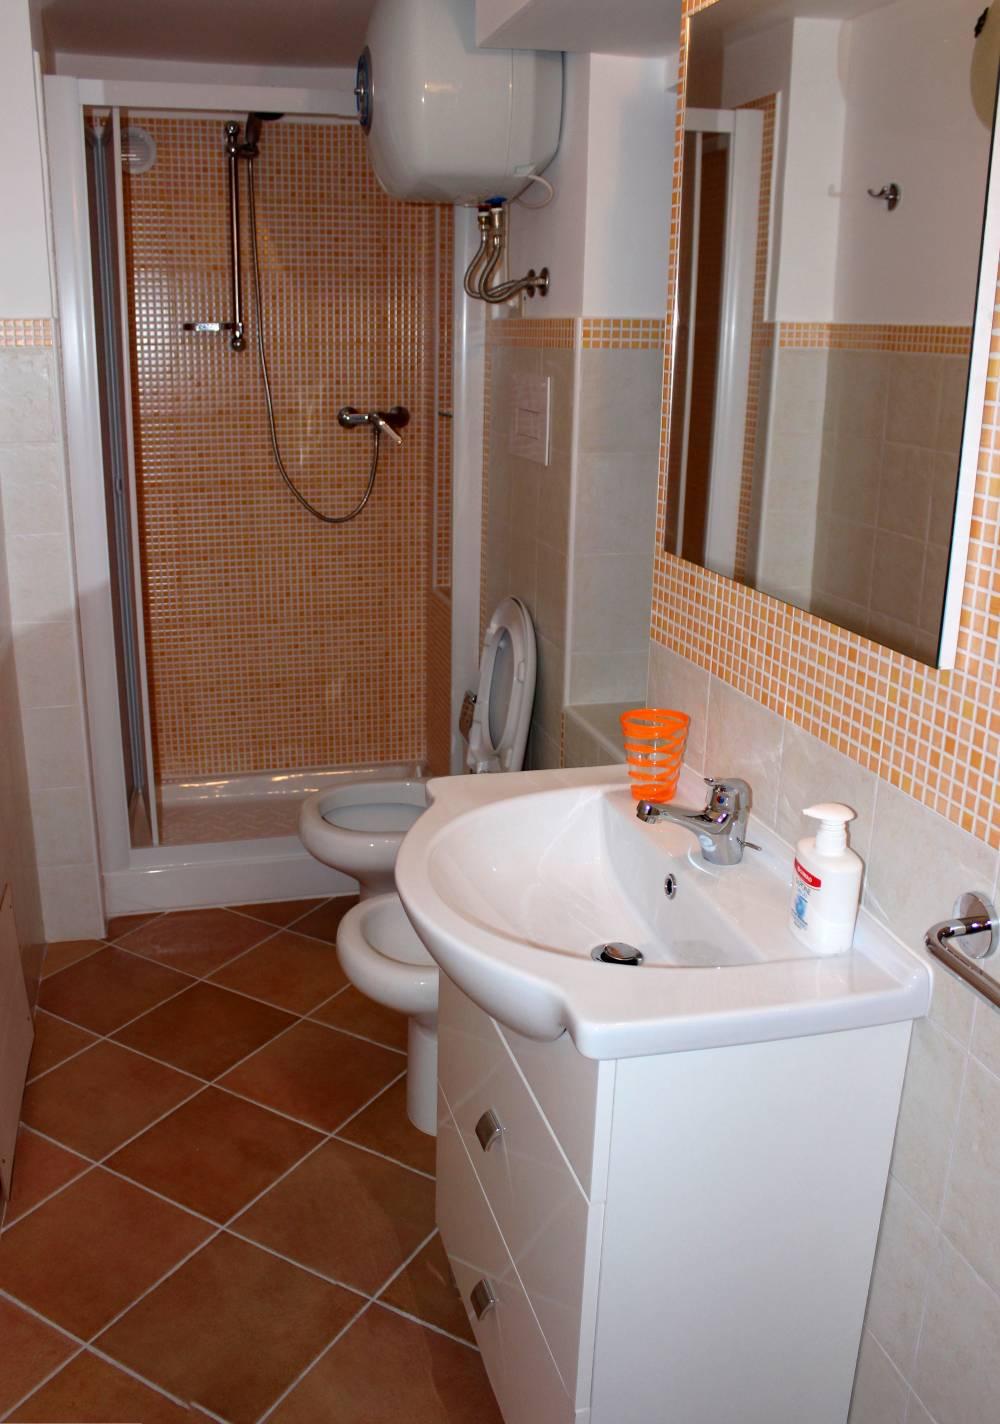 Bagno con doccia - casa per vacanze a Capo d'Orlando A35G